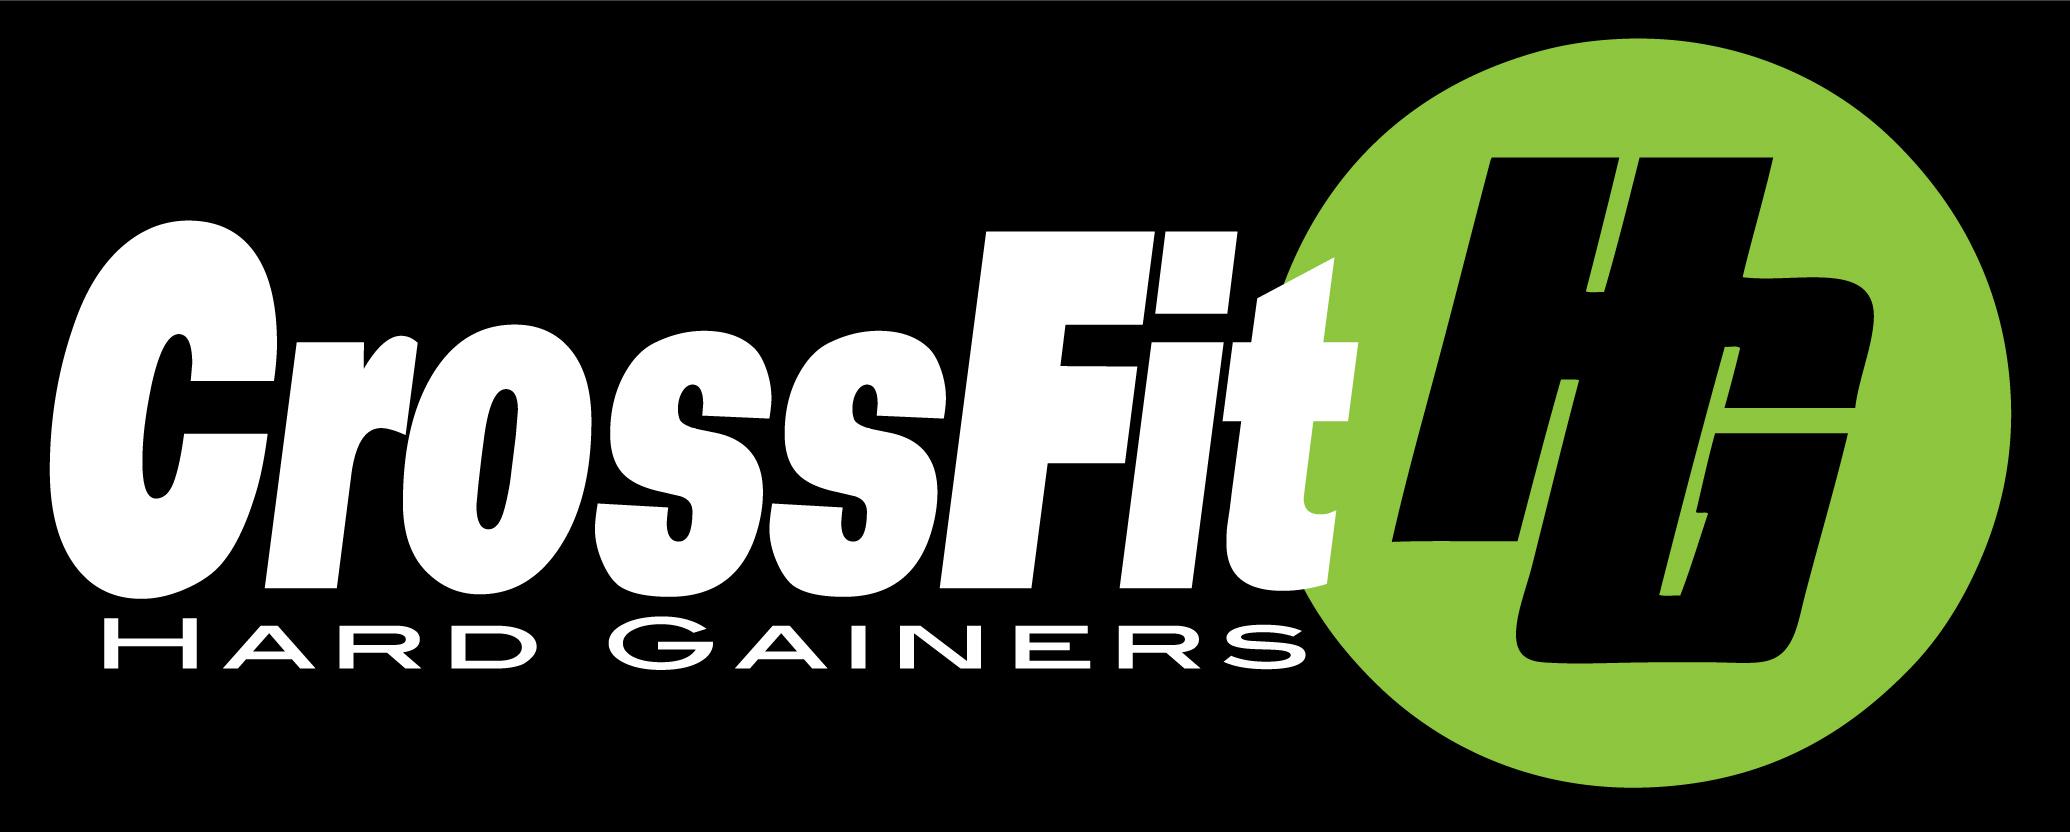 crossfit_HG_black_logo.jpg